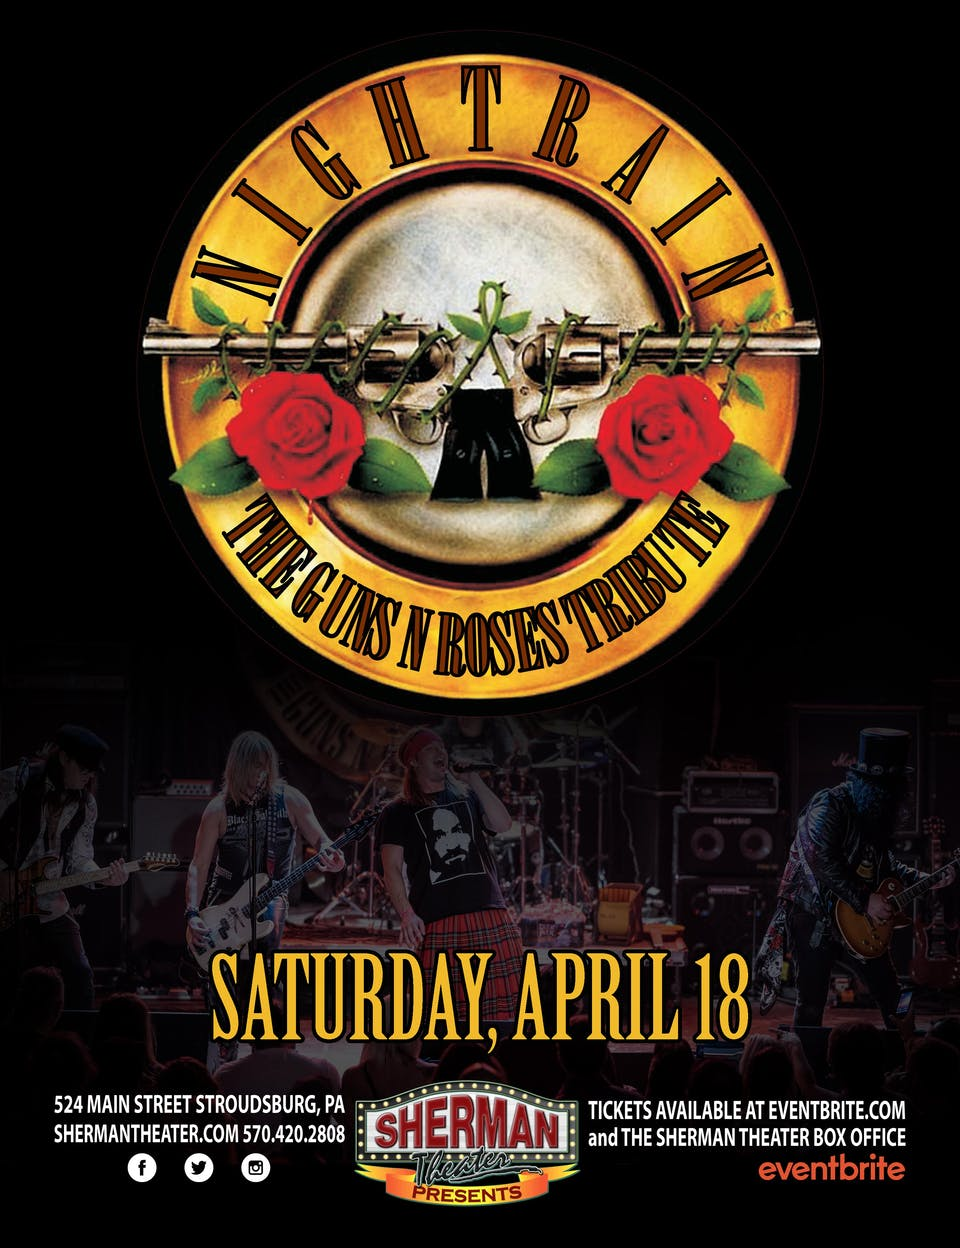 POSTPONED: Nightrain - A Guns N Roses Tribute Experience